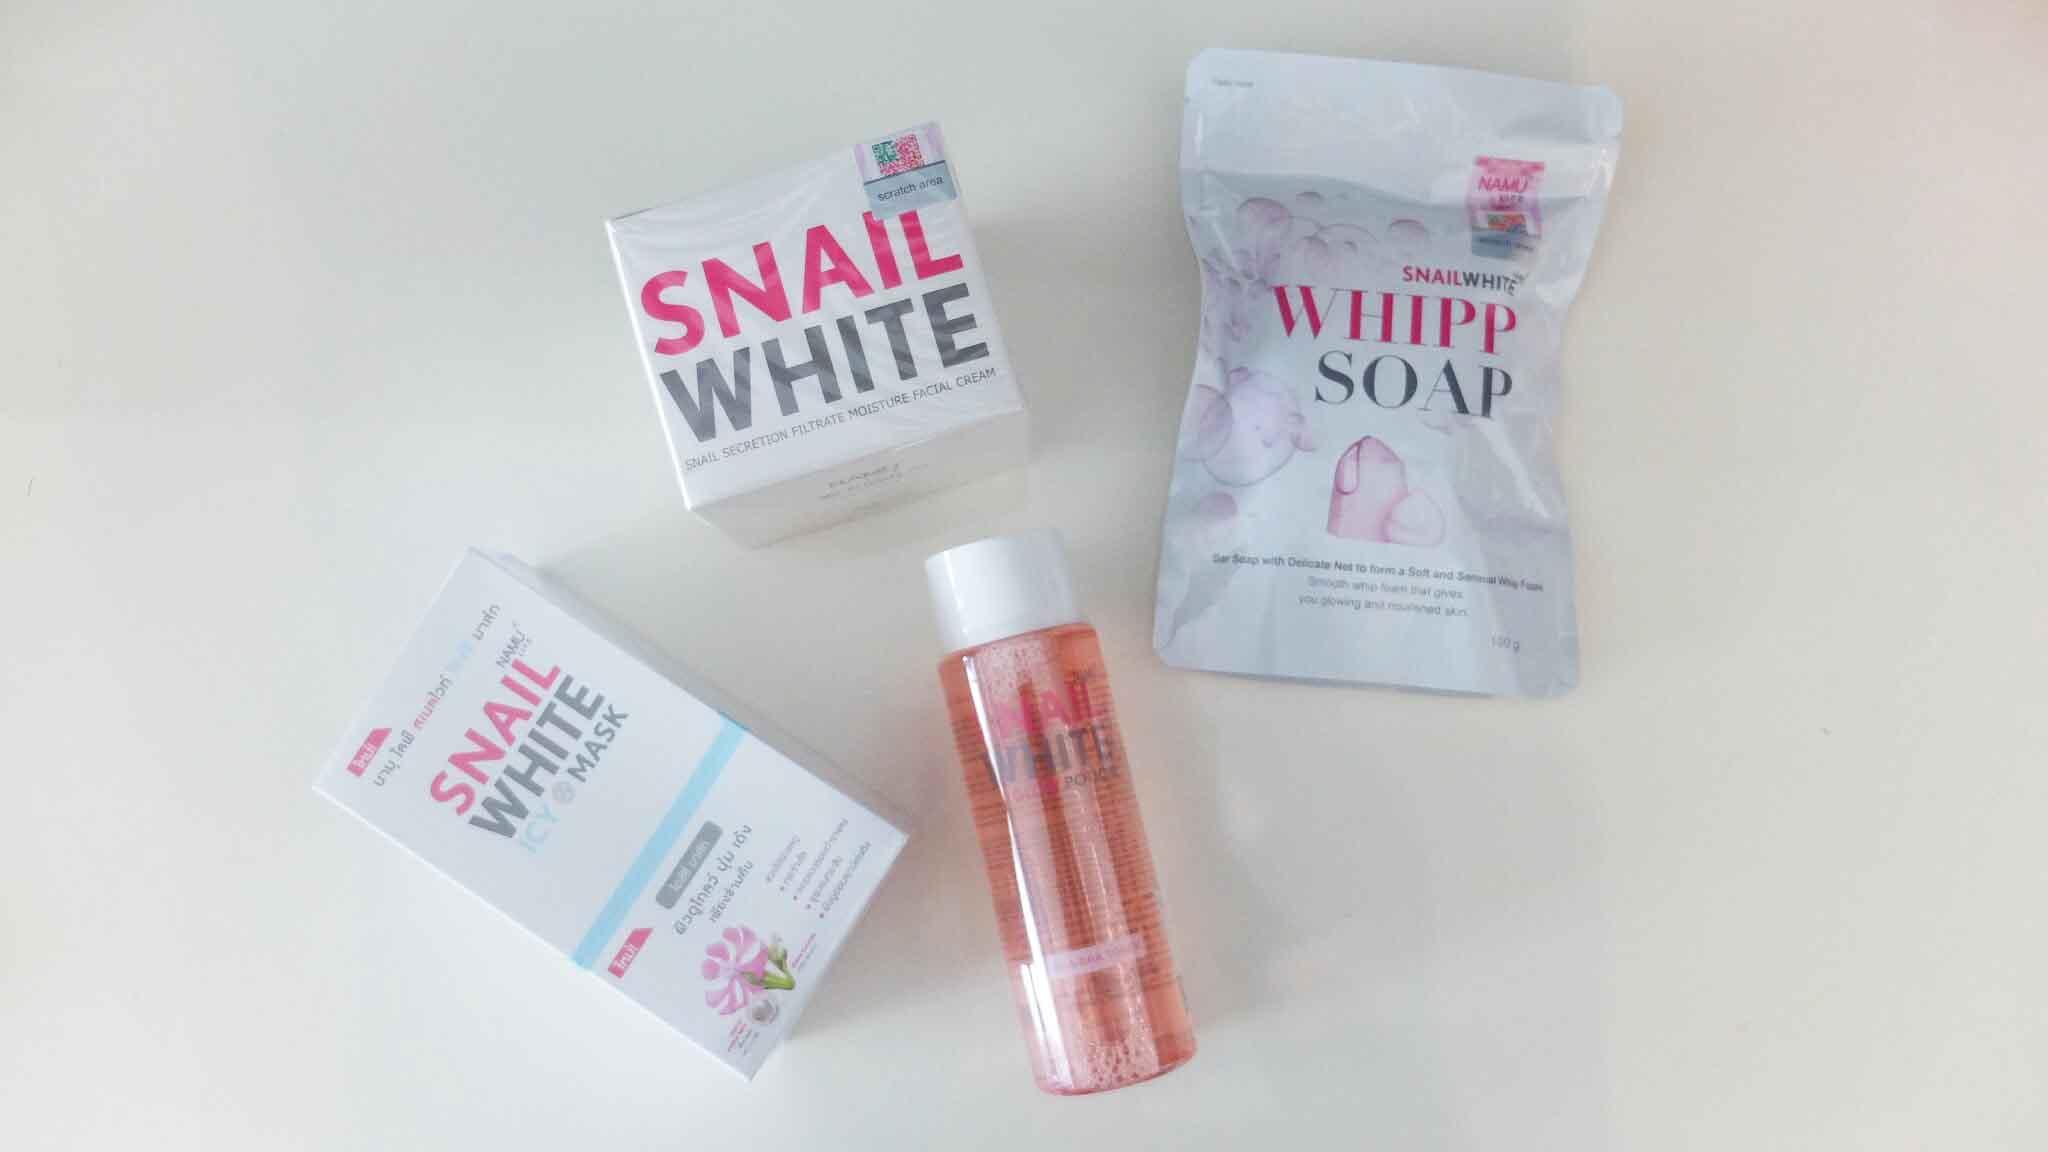 snailwhite giveaway 1